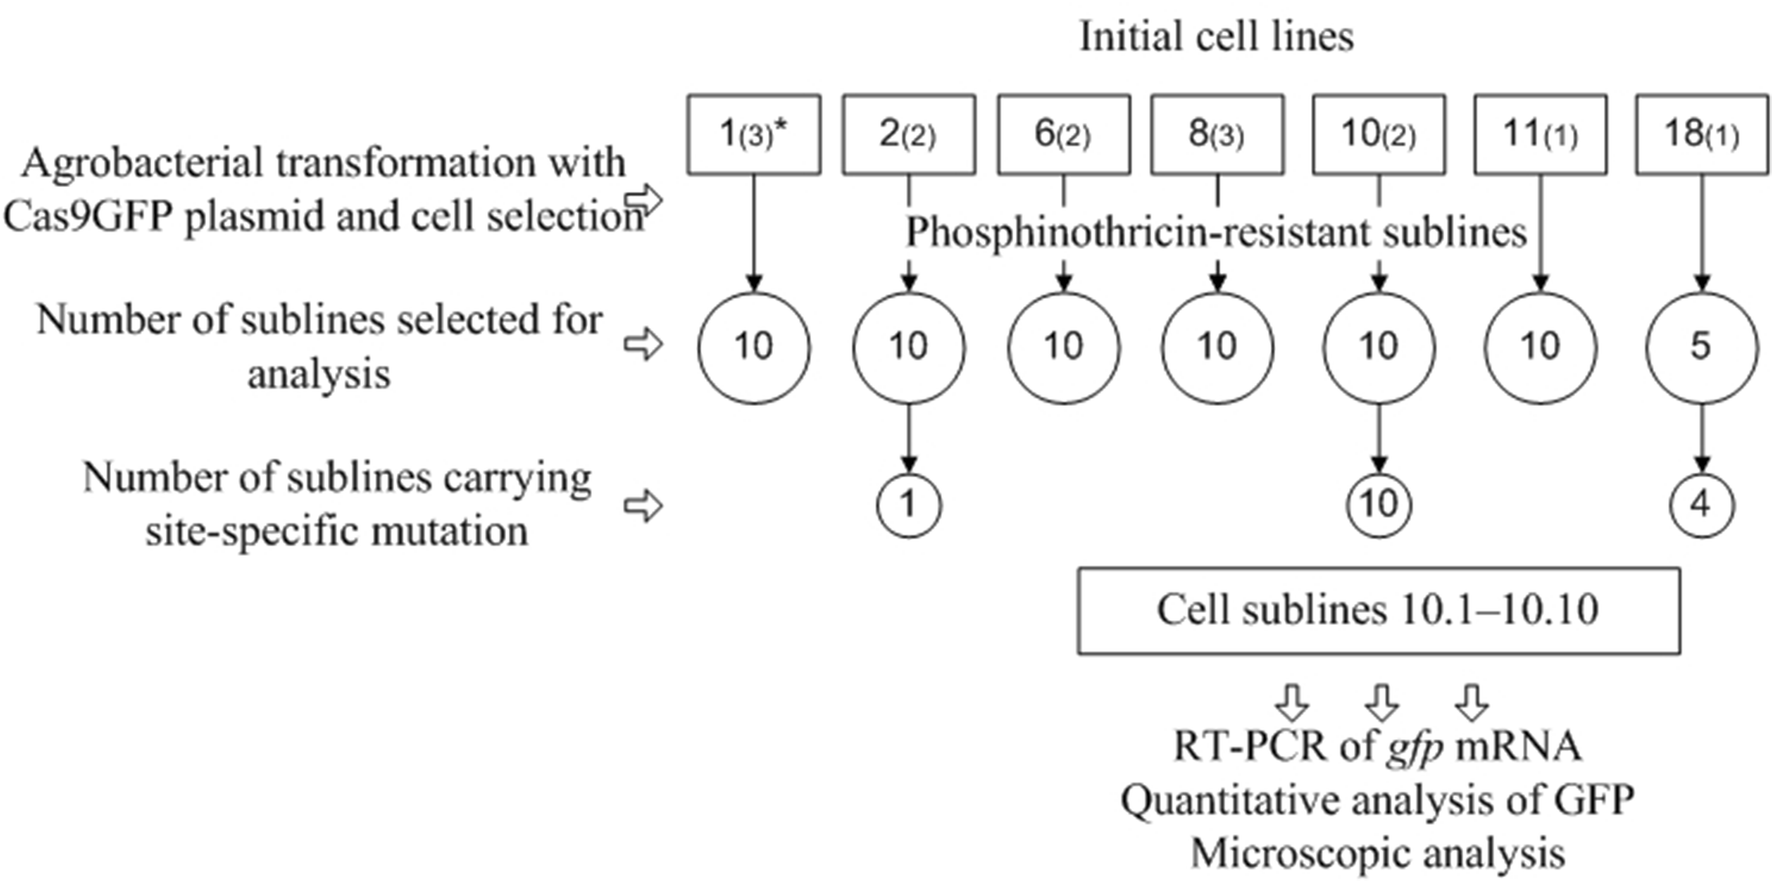 CRISPR/Cas9-mediated gfp gene inactivation in Arabidopsis suspension